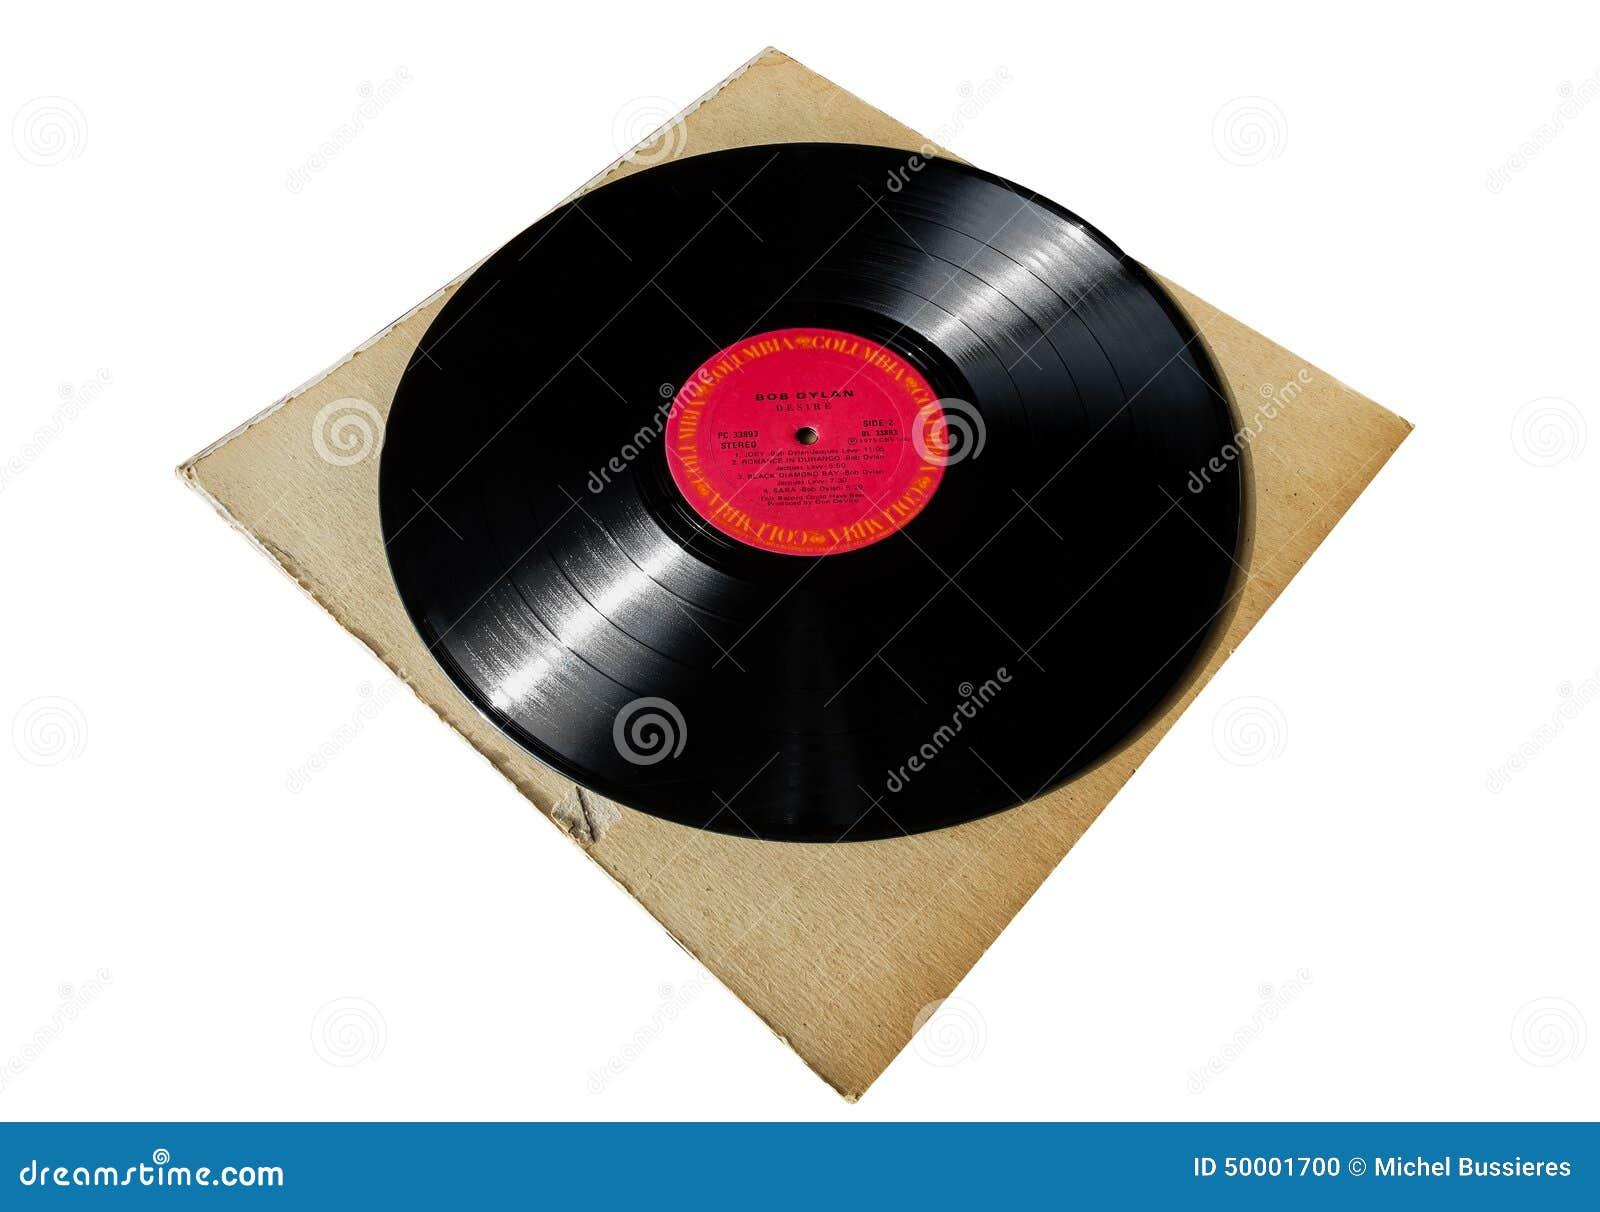 Bob Dylan Desire album editorial image  Image of nrca - 50001700